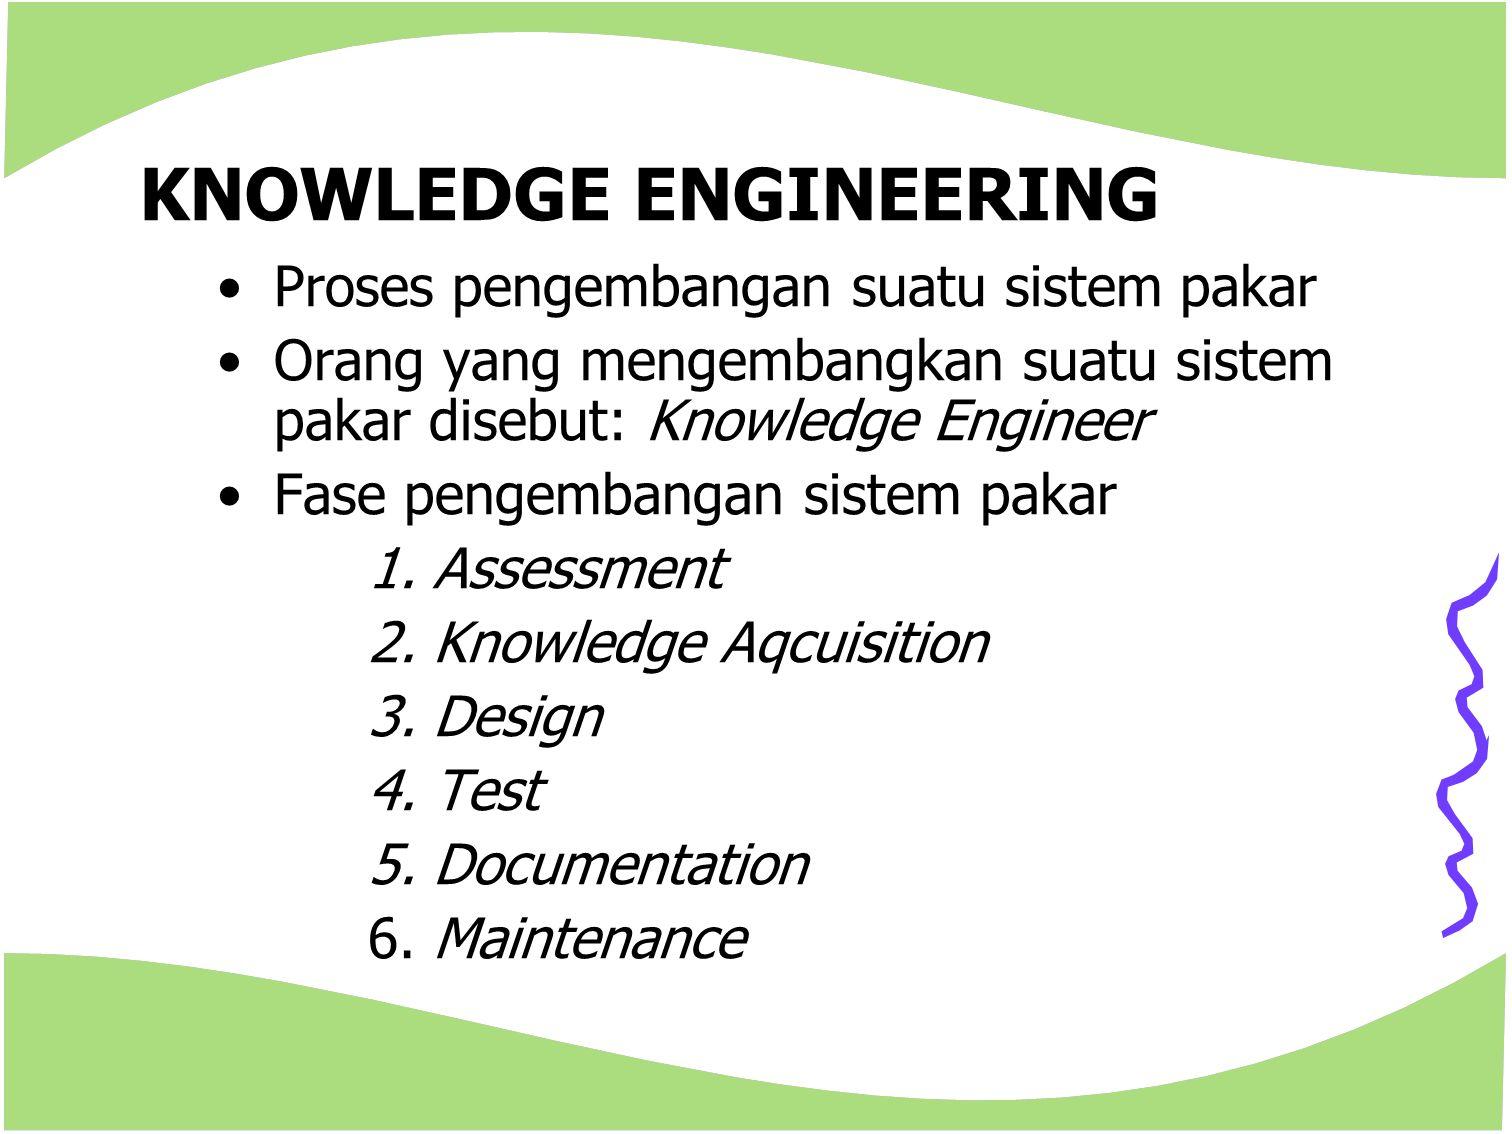 KNOWLEDGE ENGINEERING Proses pengembangan suatu sistem pakar Orang yang mengembangkan suatu sistem pakar disebut: Knowledge Engineer Fase pengembangan